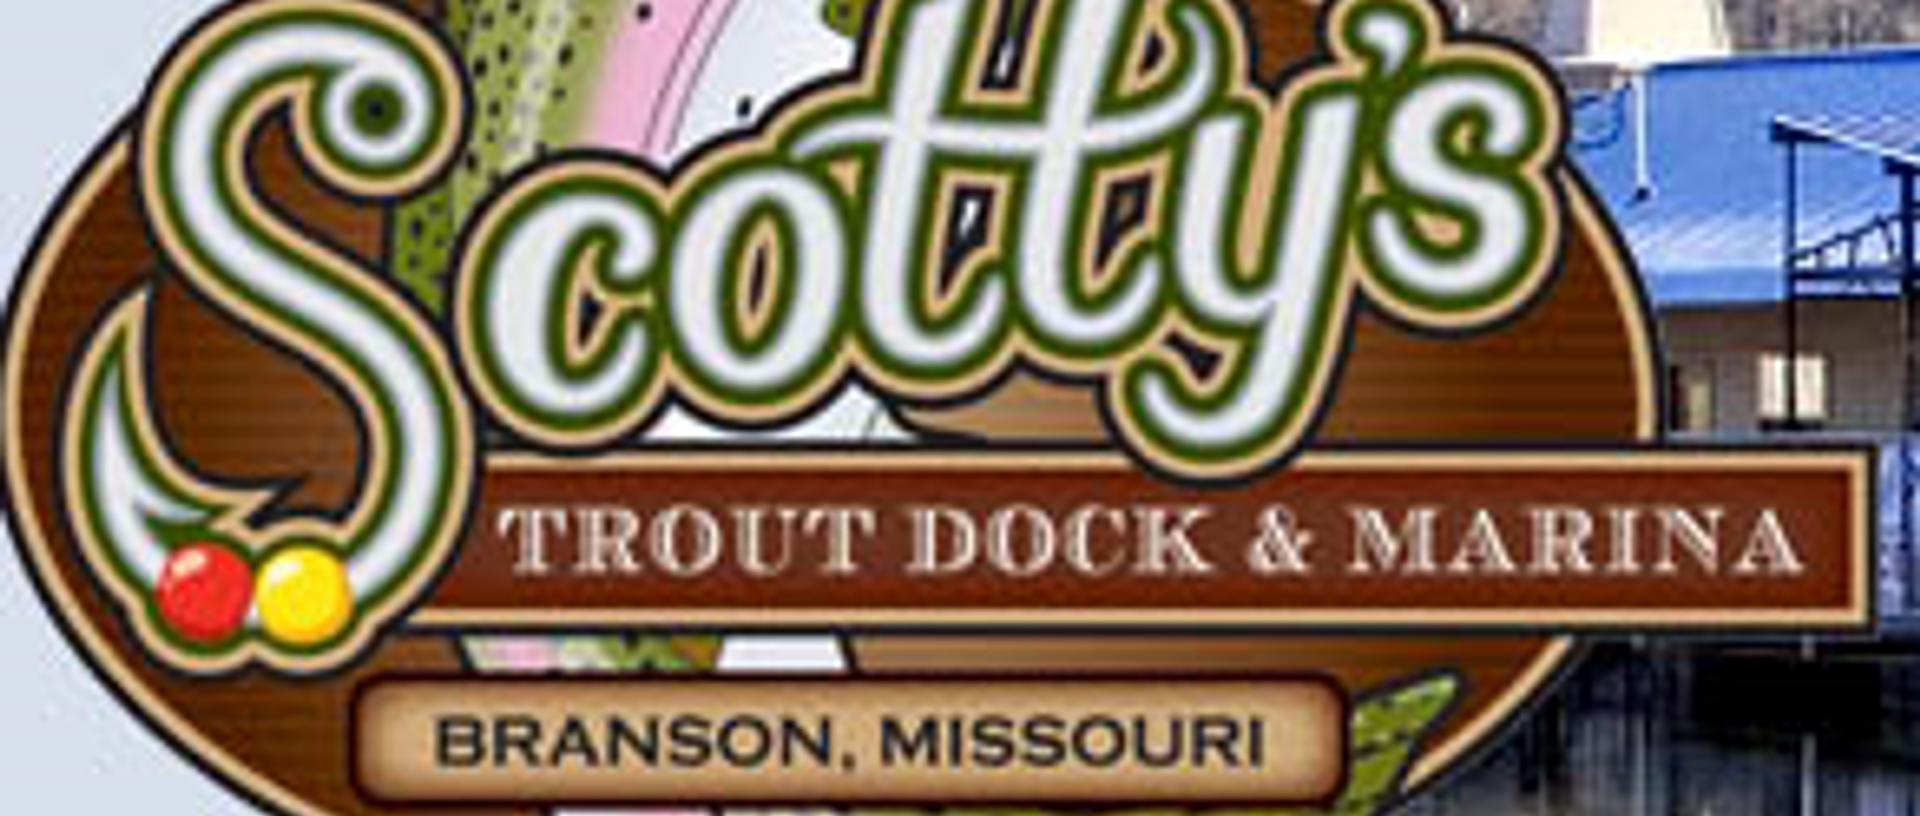 Scotty's Trout Dock